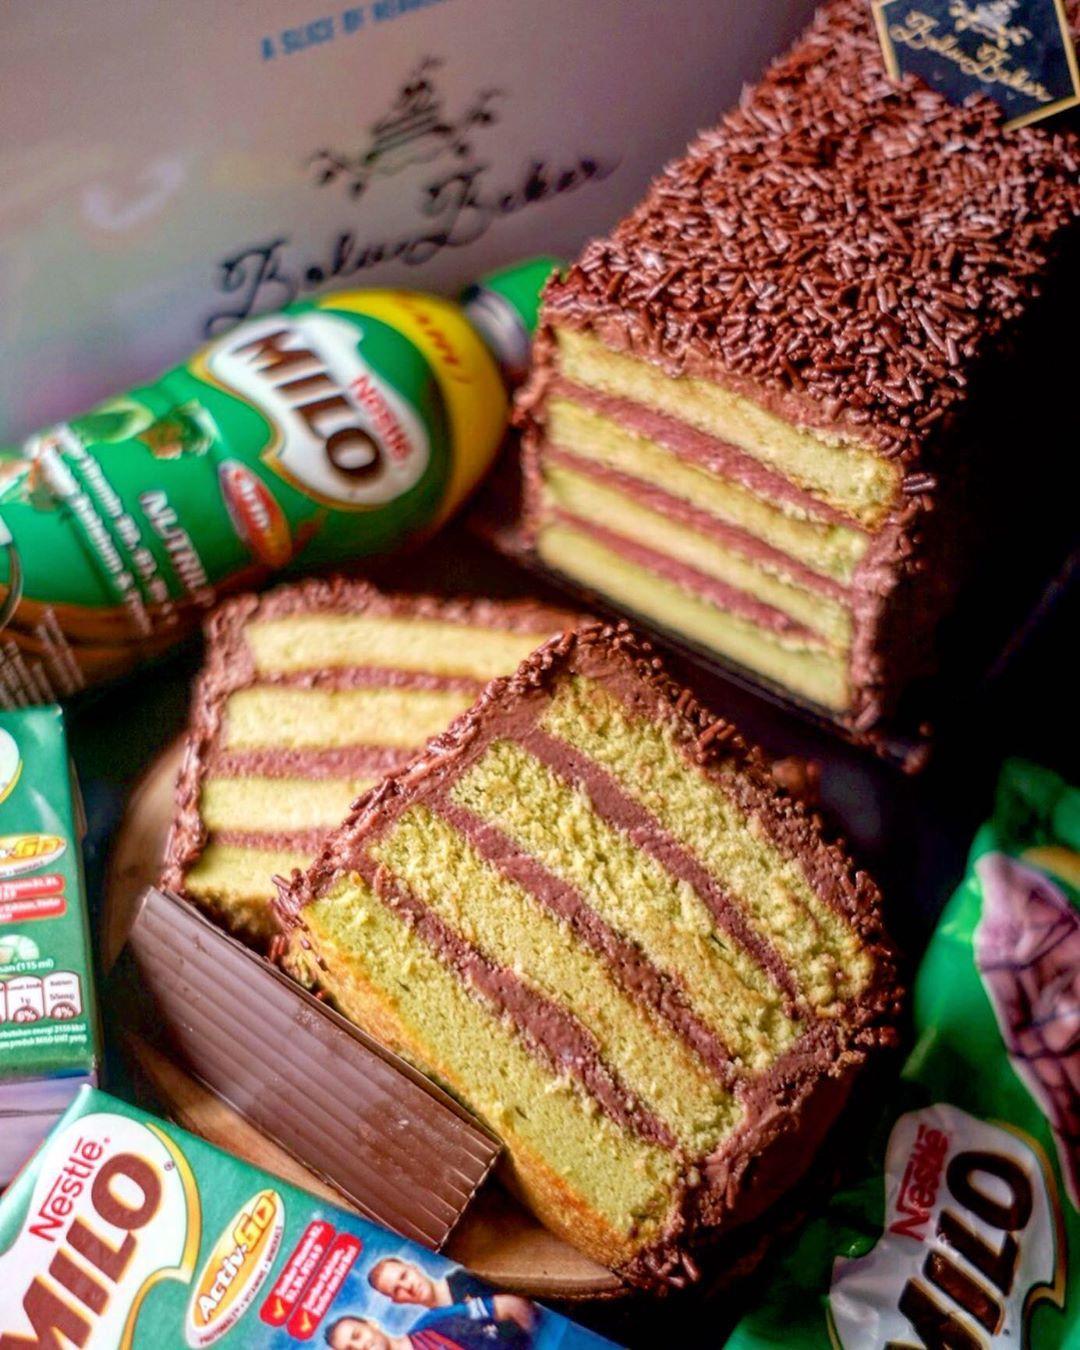 Ice Milo Cake Pertama Di Jogja Premium Cake Real Milo Good Quality Mesies Wow Tobat Ni Lidah Dibikin Kejet Kejet Resep Kue Resep Kue